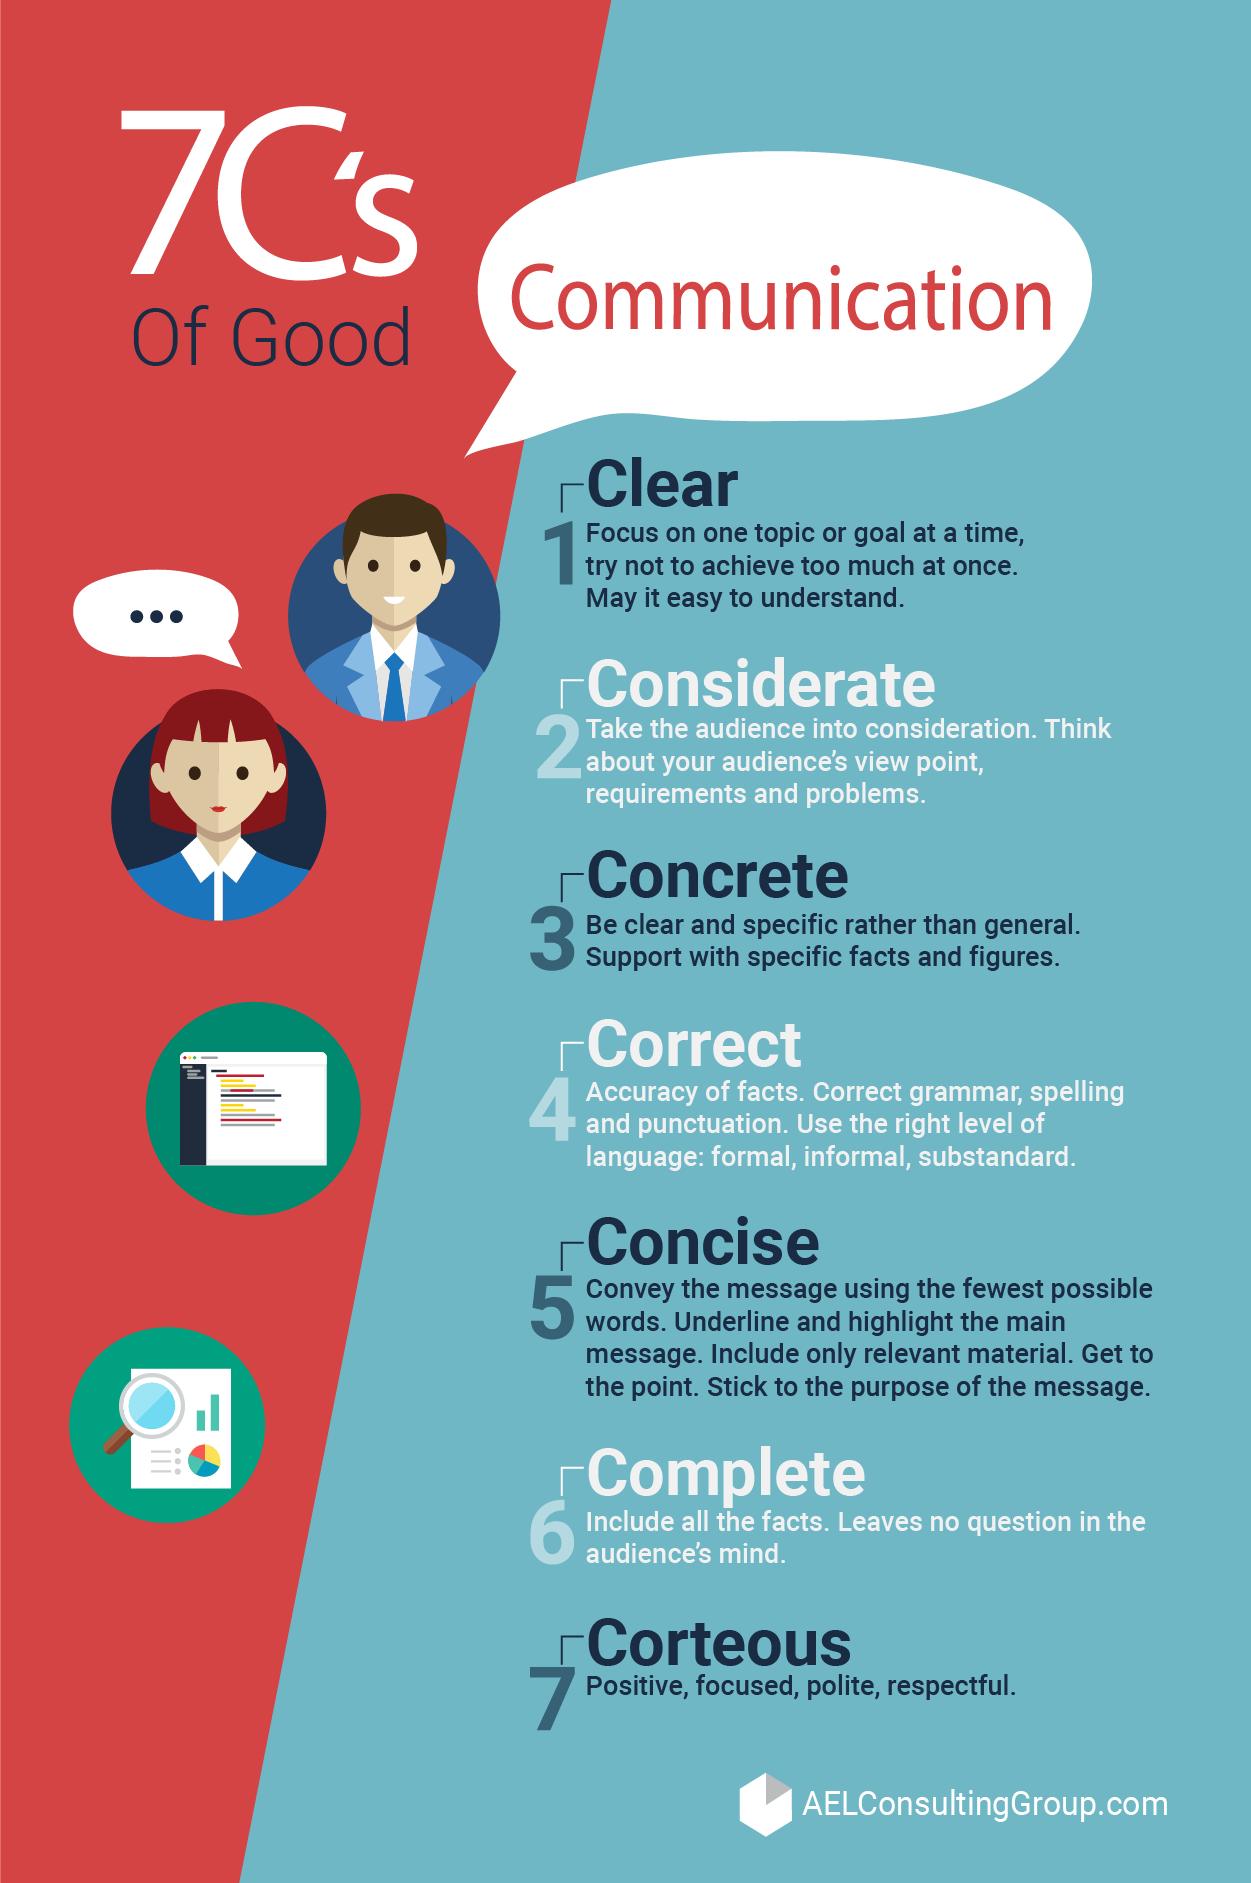 7C's of a Good Communication #communication #managementcoaching #businesscoaching #leadership #managem…   Good communication, Effective communication, Communication